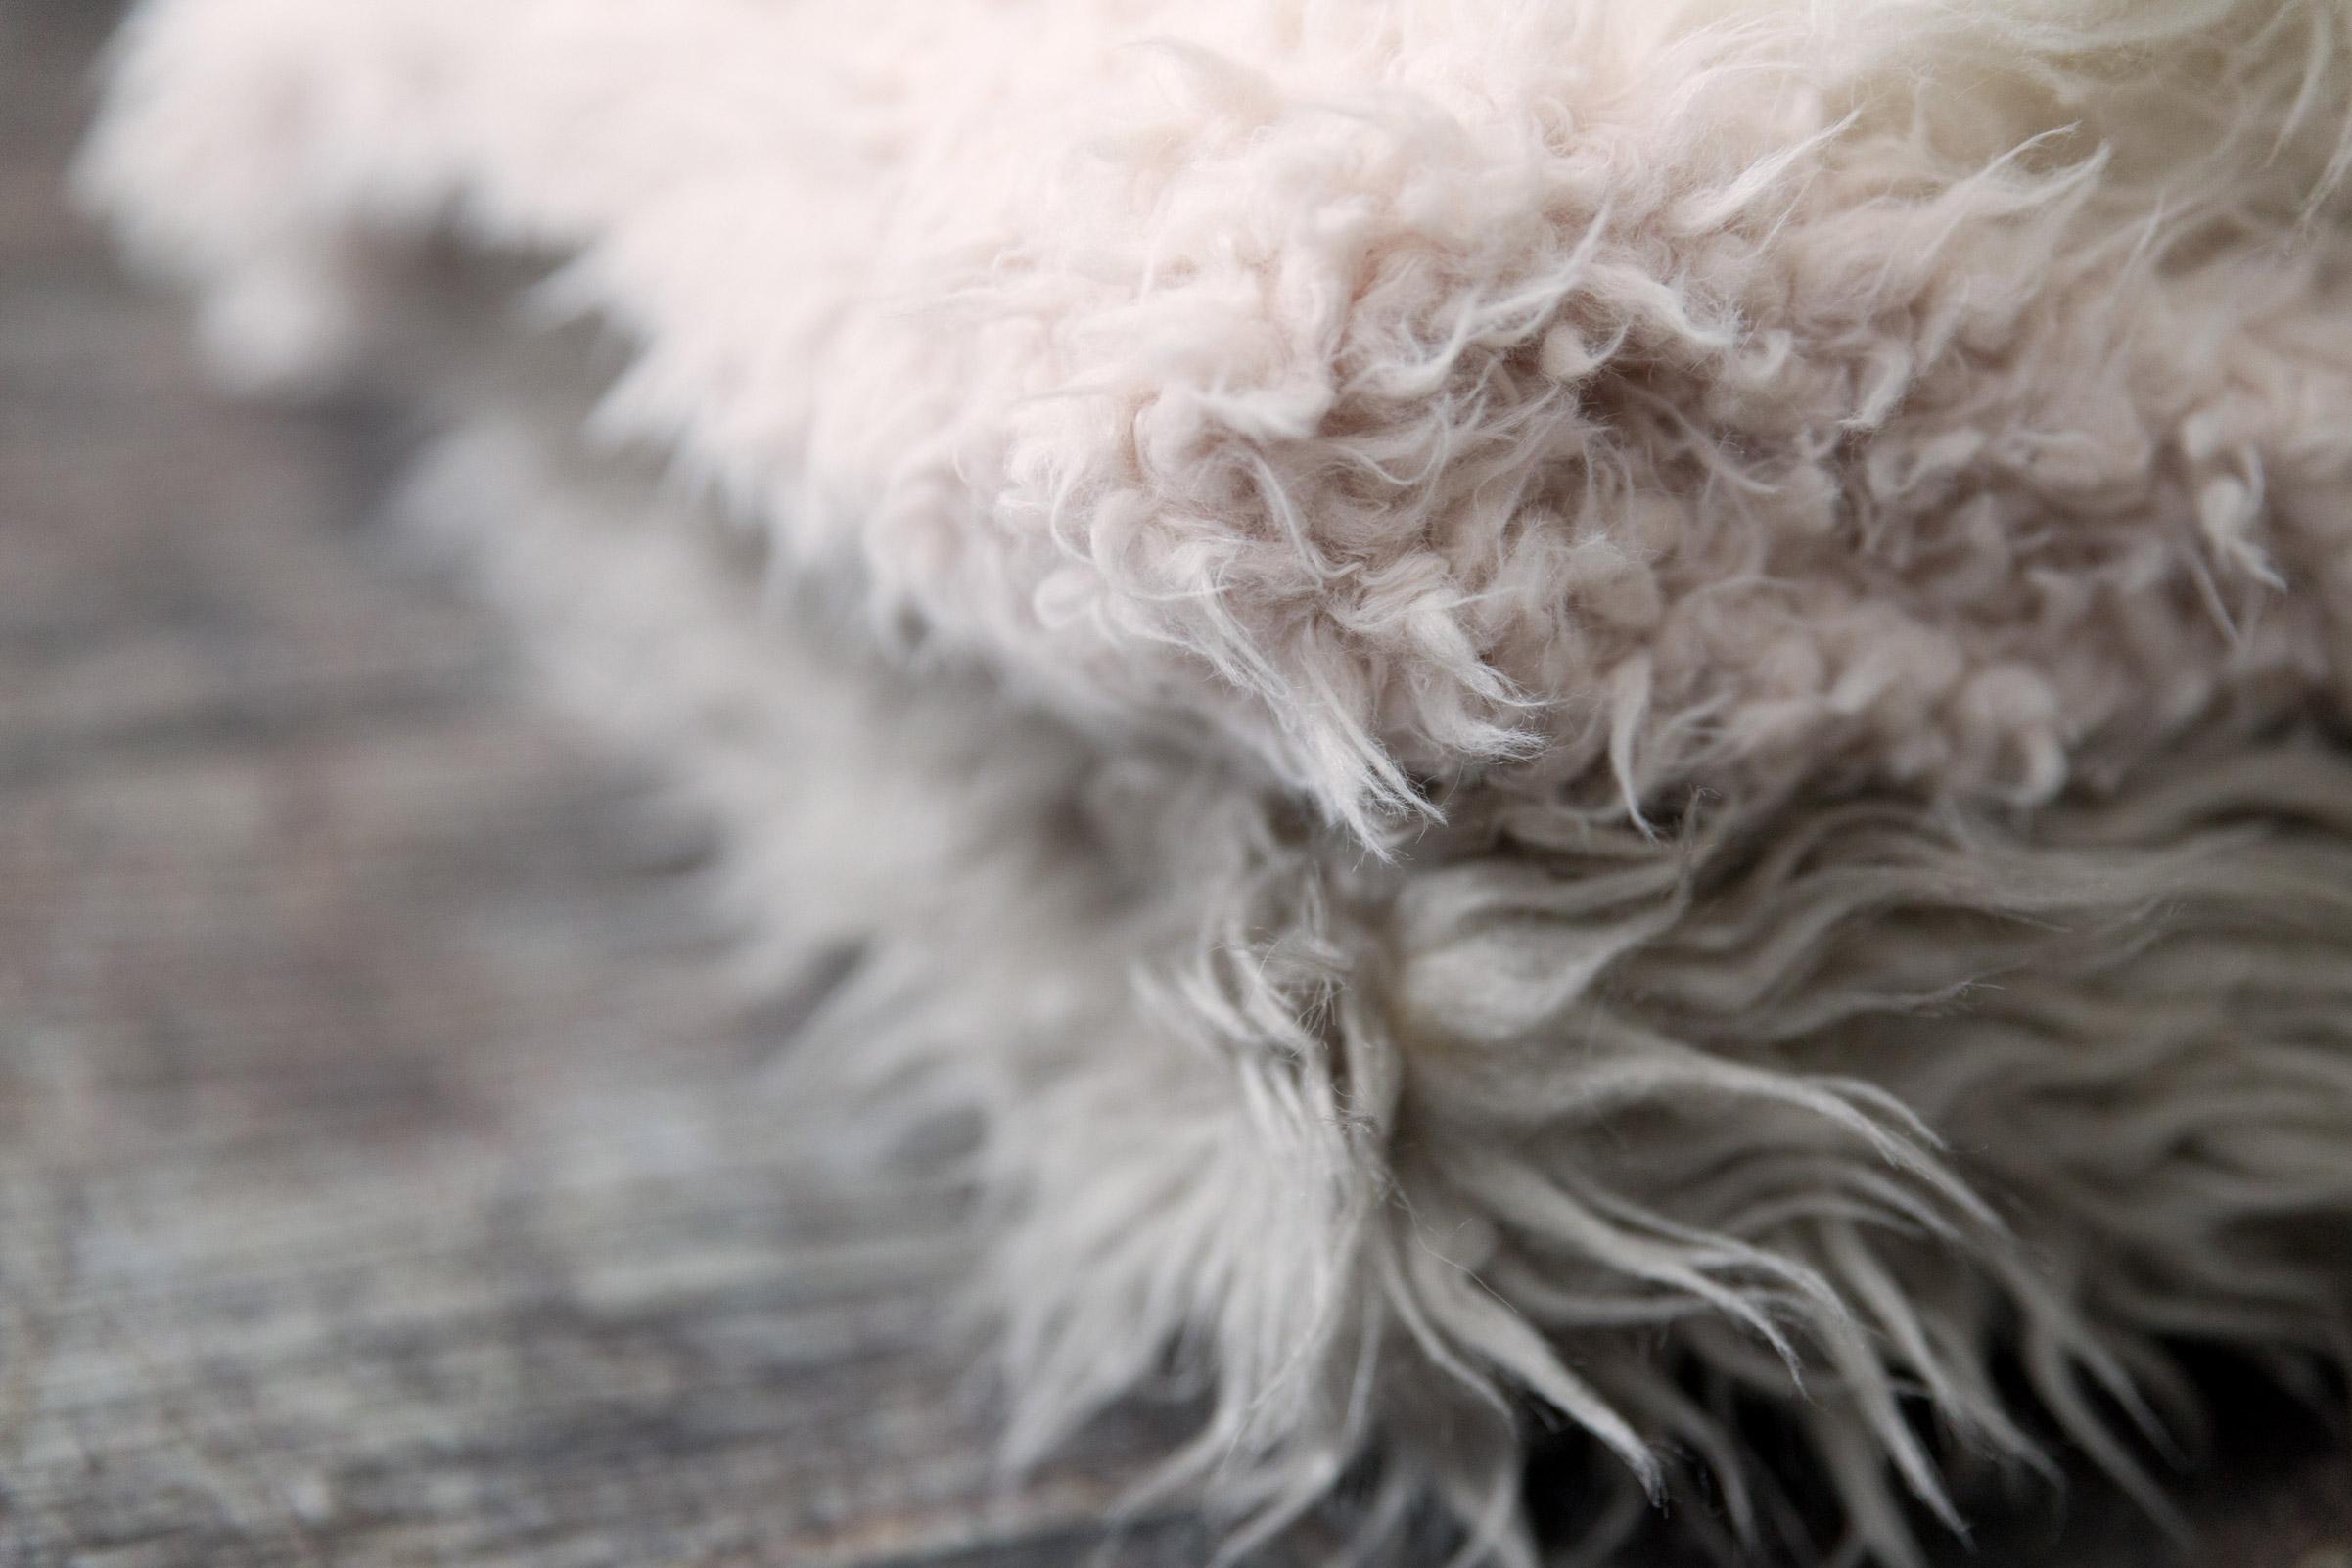 newborn-photos-st-albans-props-fur.jpg